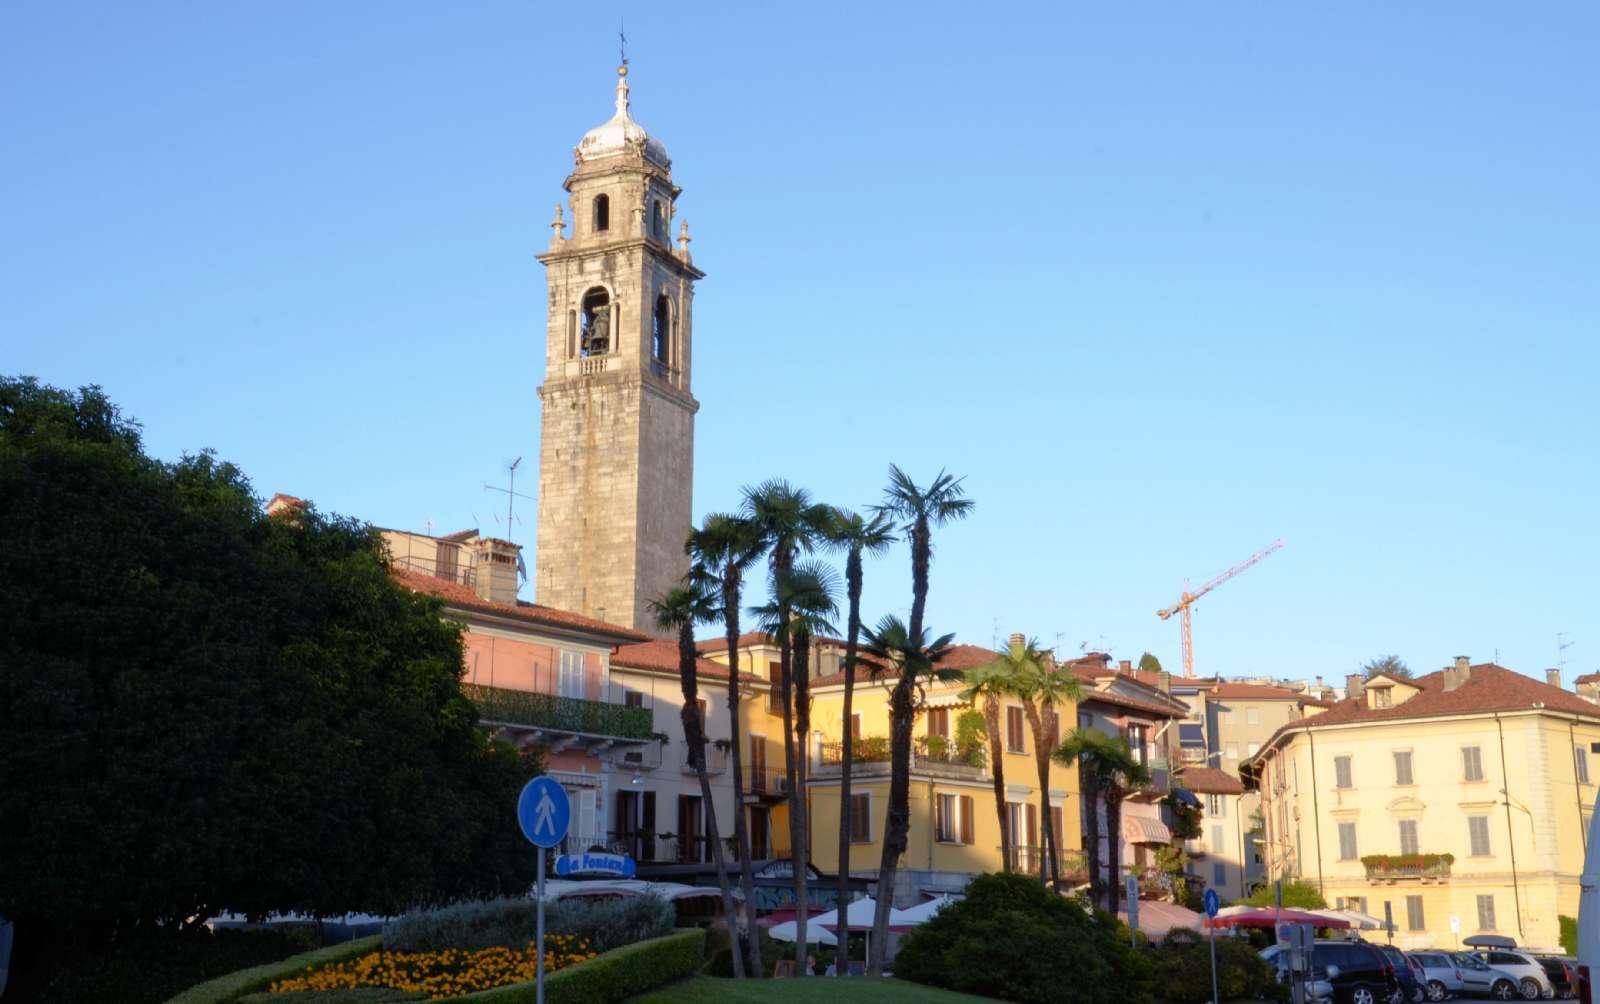 Bydelen Pallanza